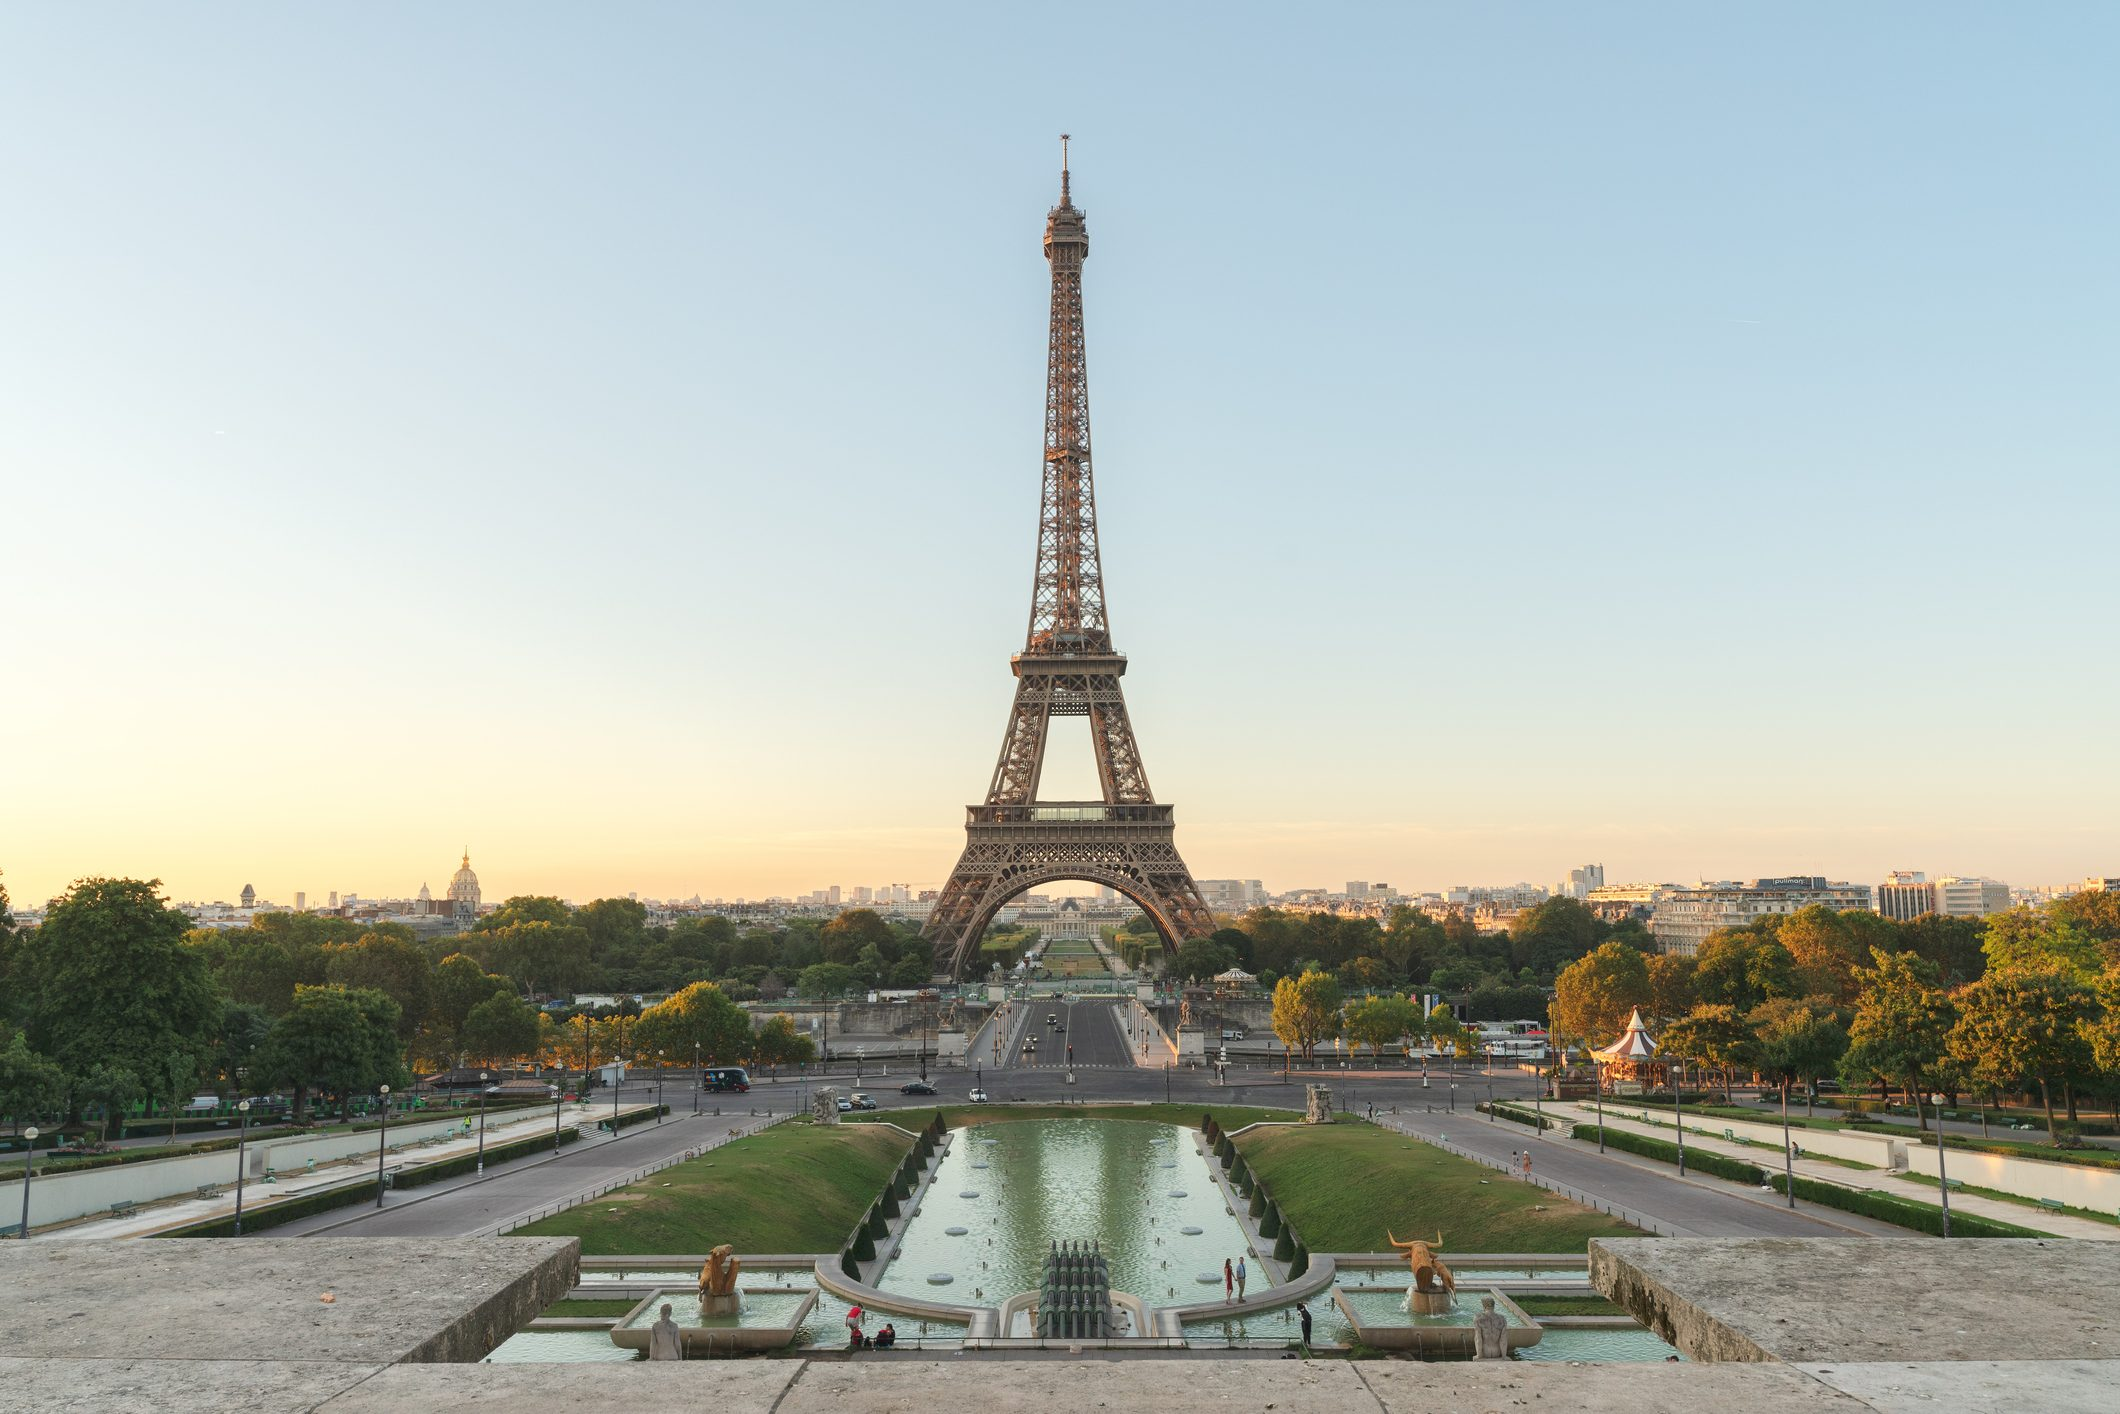 View of Eiffel Tower from Palais de Chaillot, Paris, France